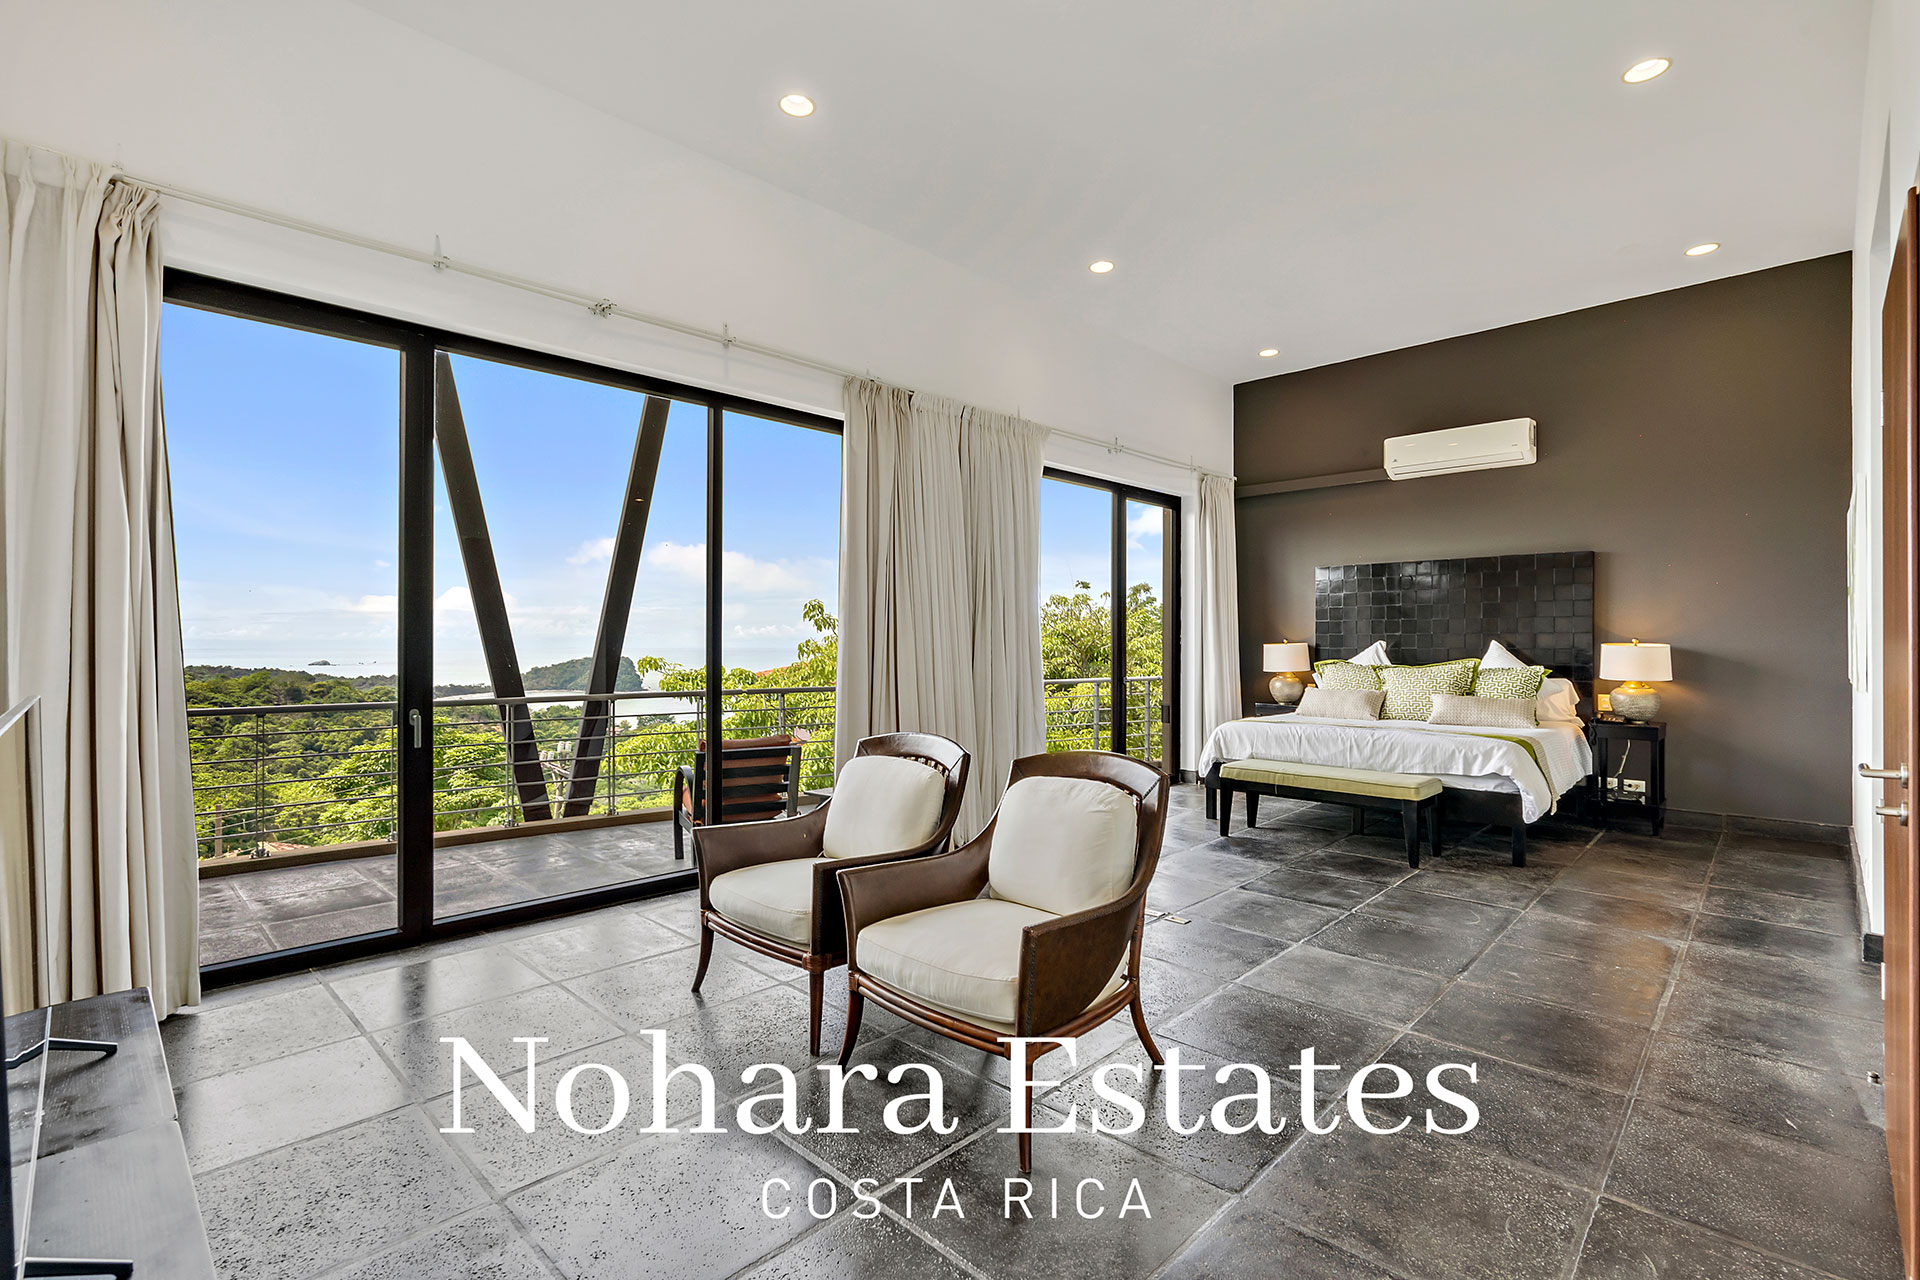 Nohara Estates Costa Rica 128 Penthouse Quepos Los Altos 2